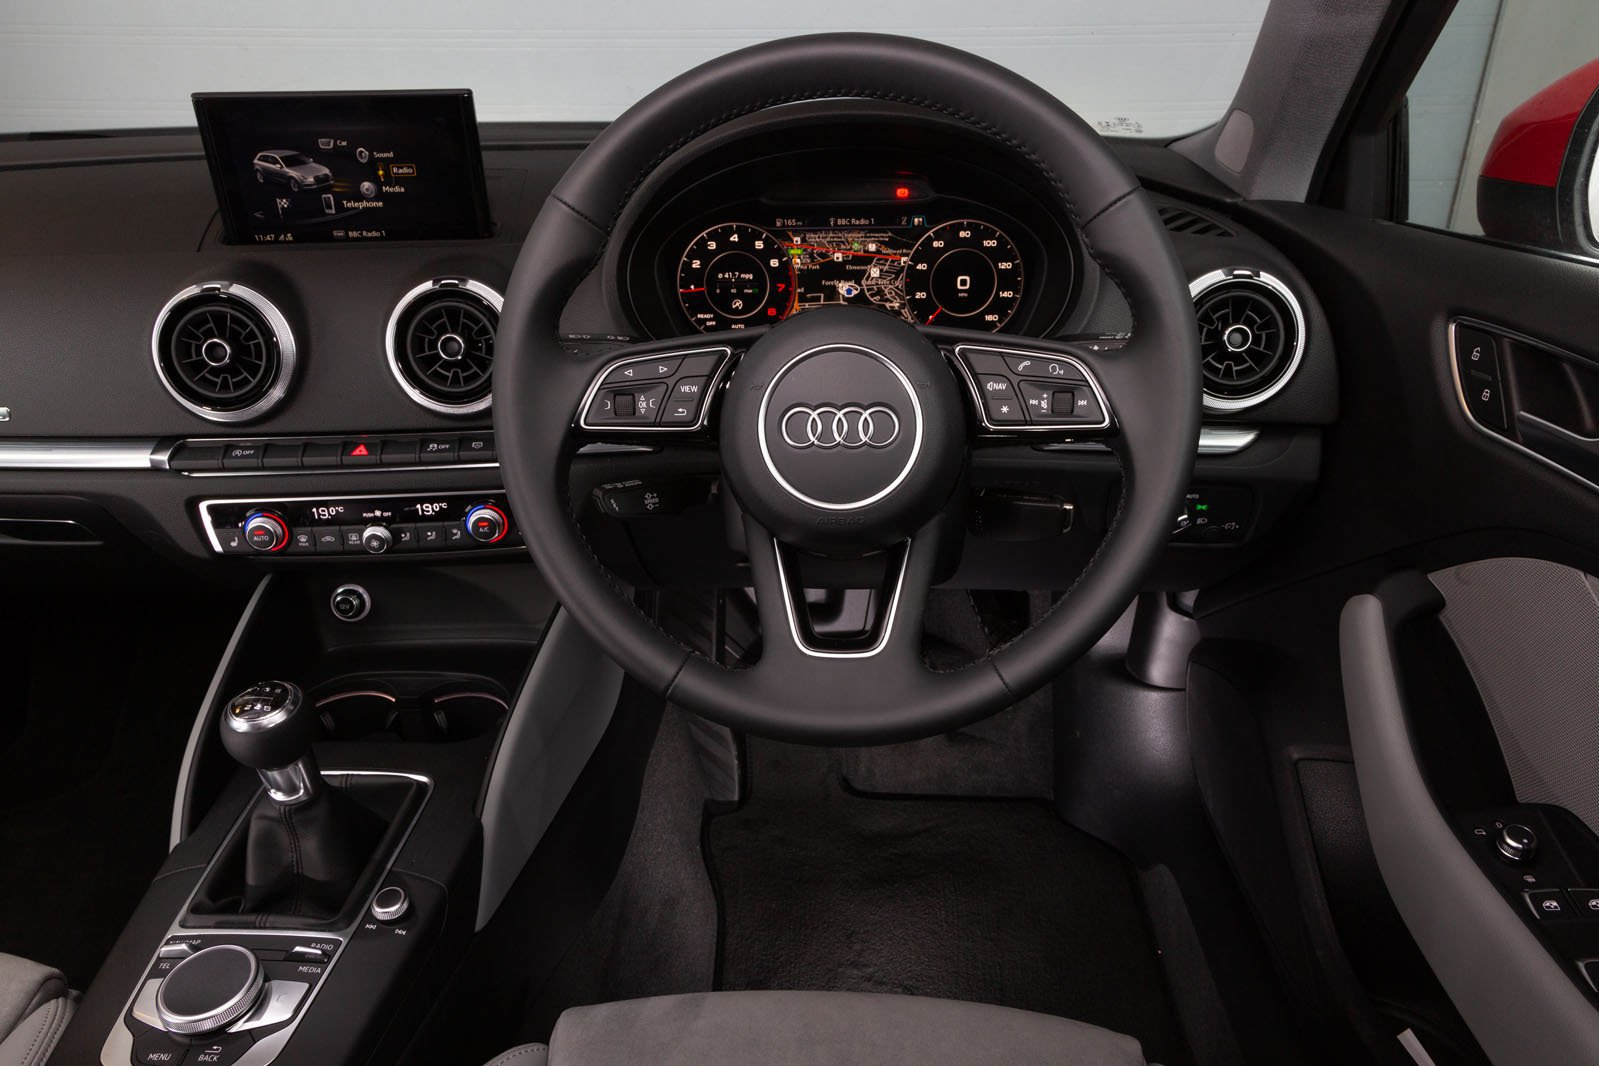 Audi A3 30 TFSI Sport S tronic - interior